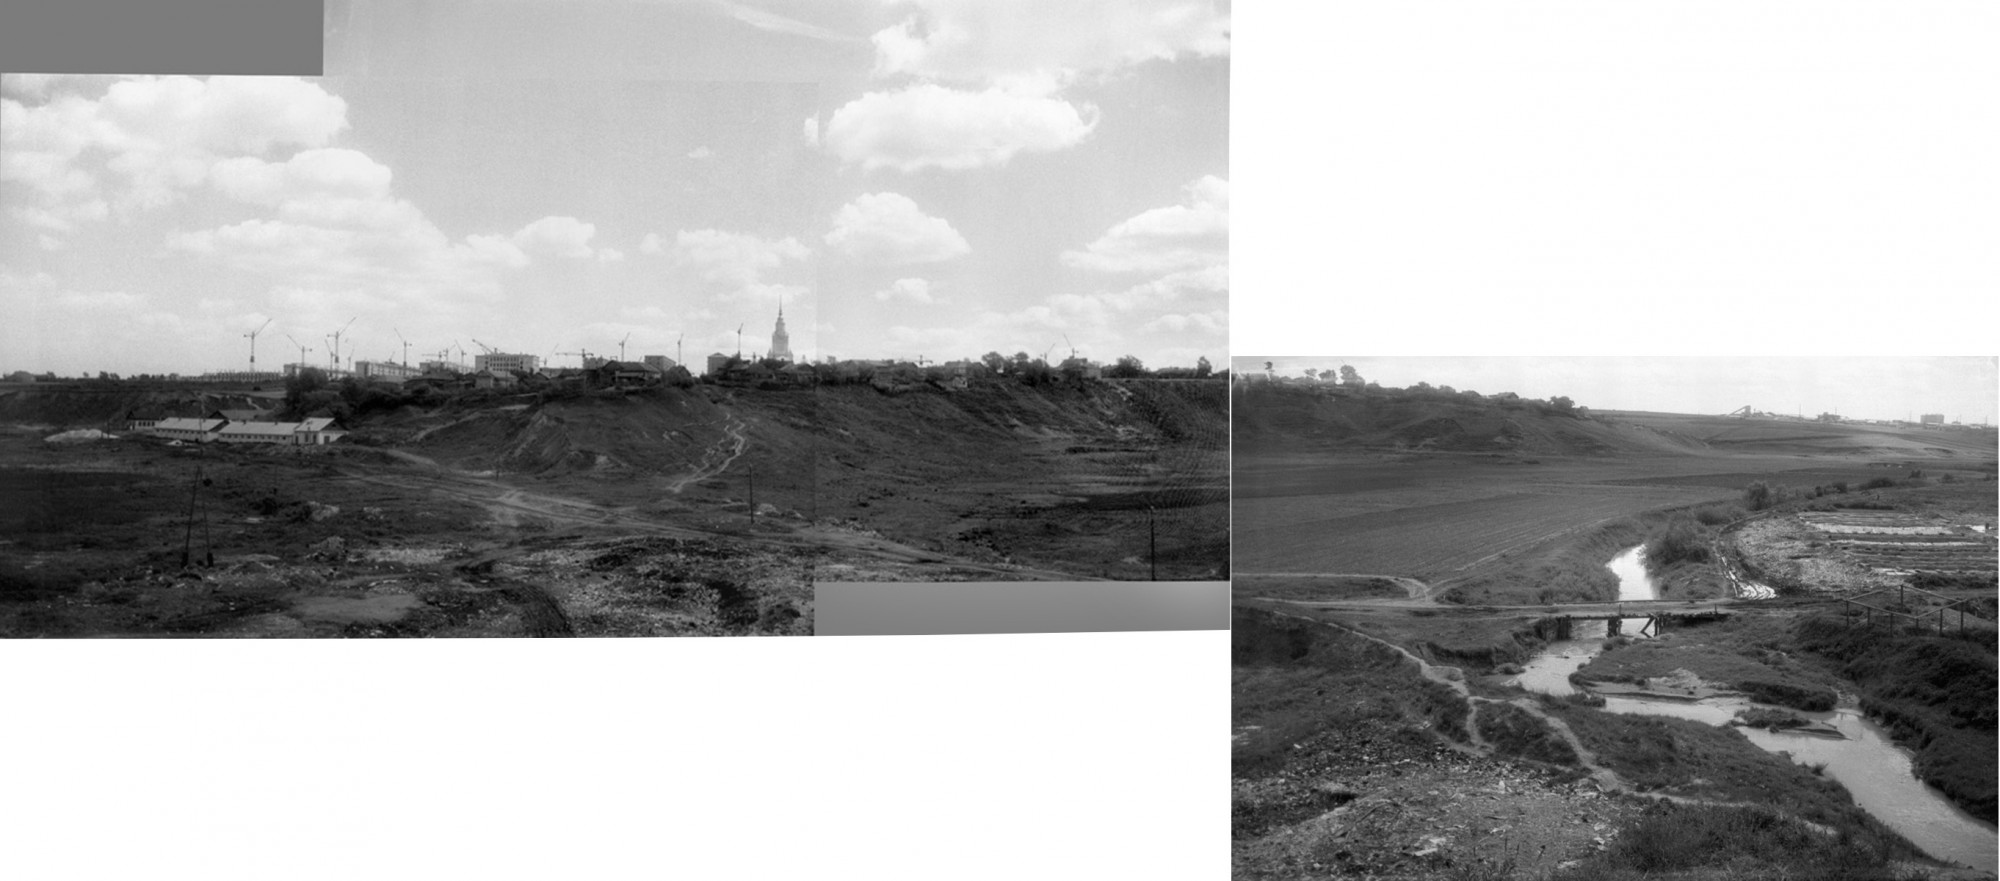 1957-58 Панорама. Борис Смирнов-Русецкий. Архив Владимира Александровича Карлова2